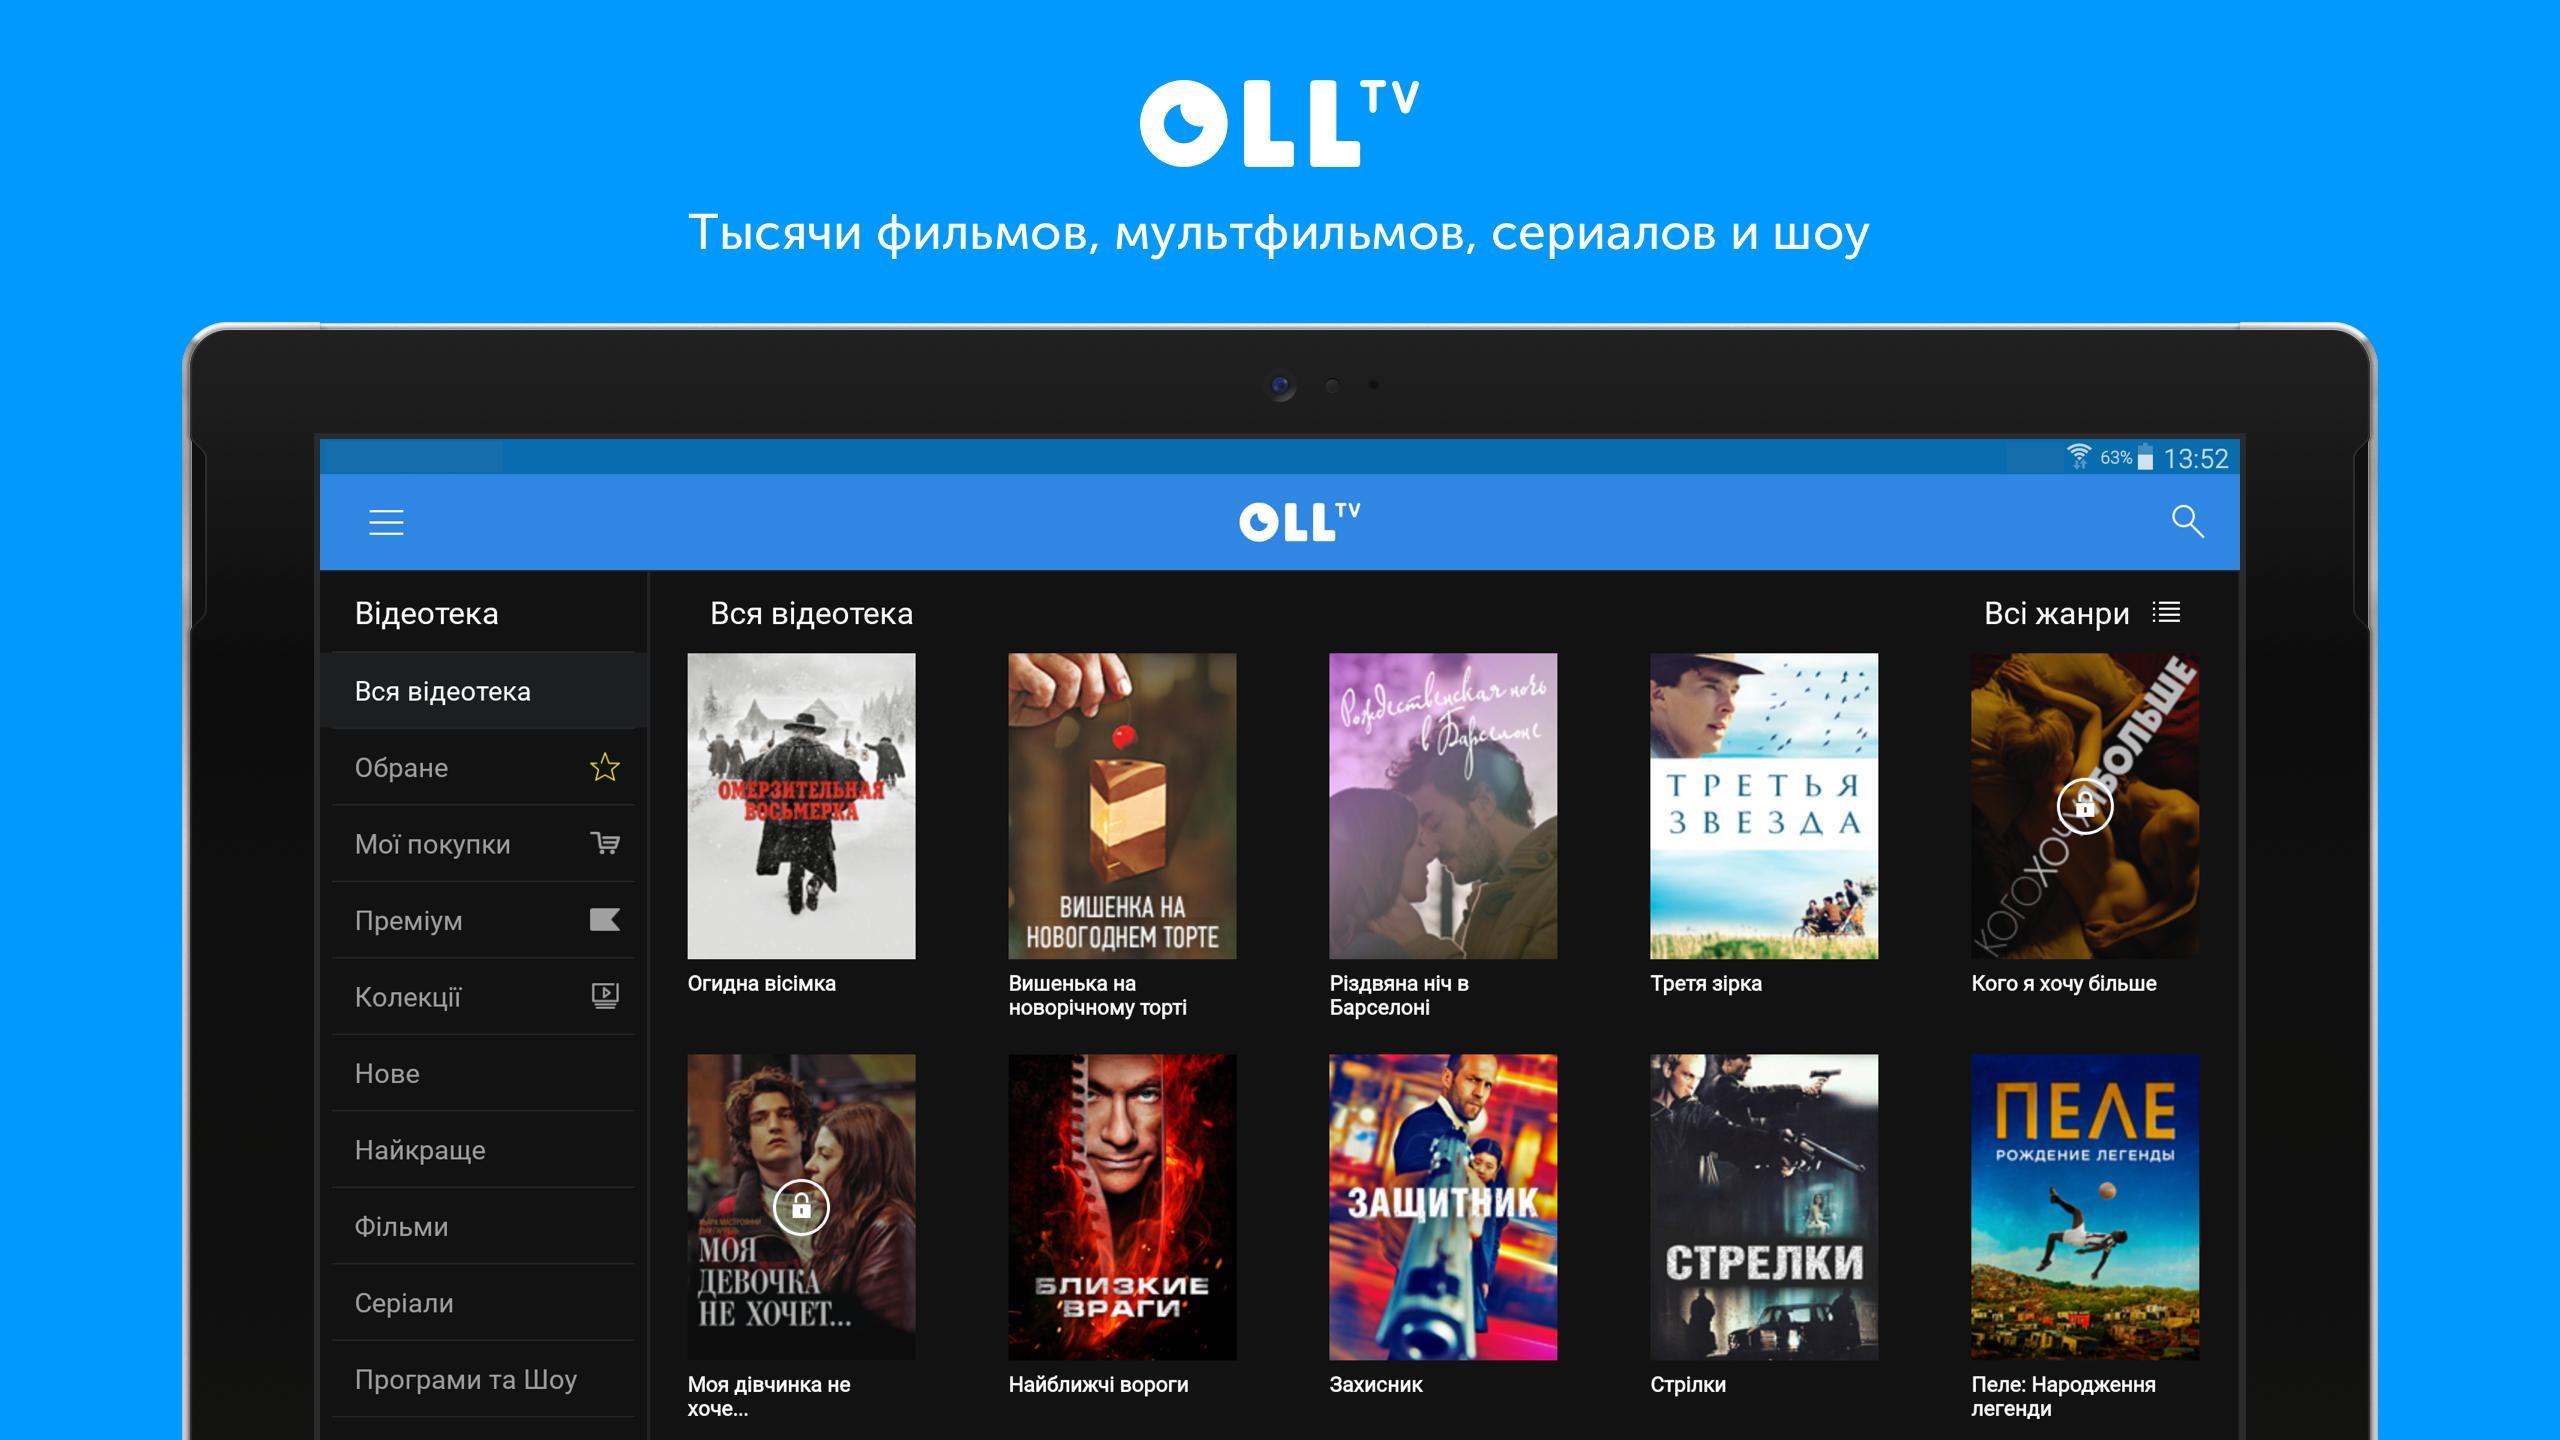 OLL.TV - ТВ онлайн, футбол, кино, фильмы и сериалы for